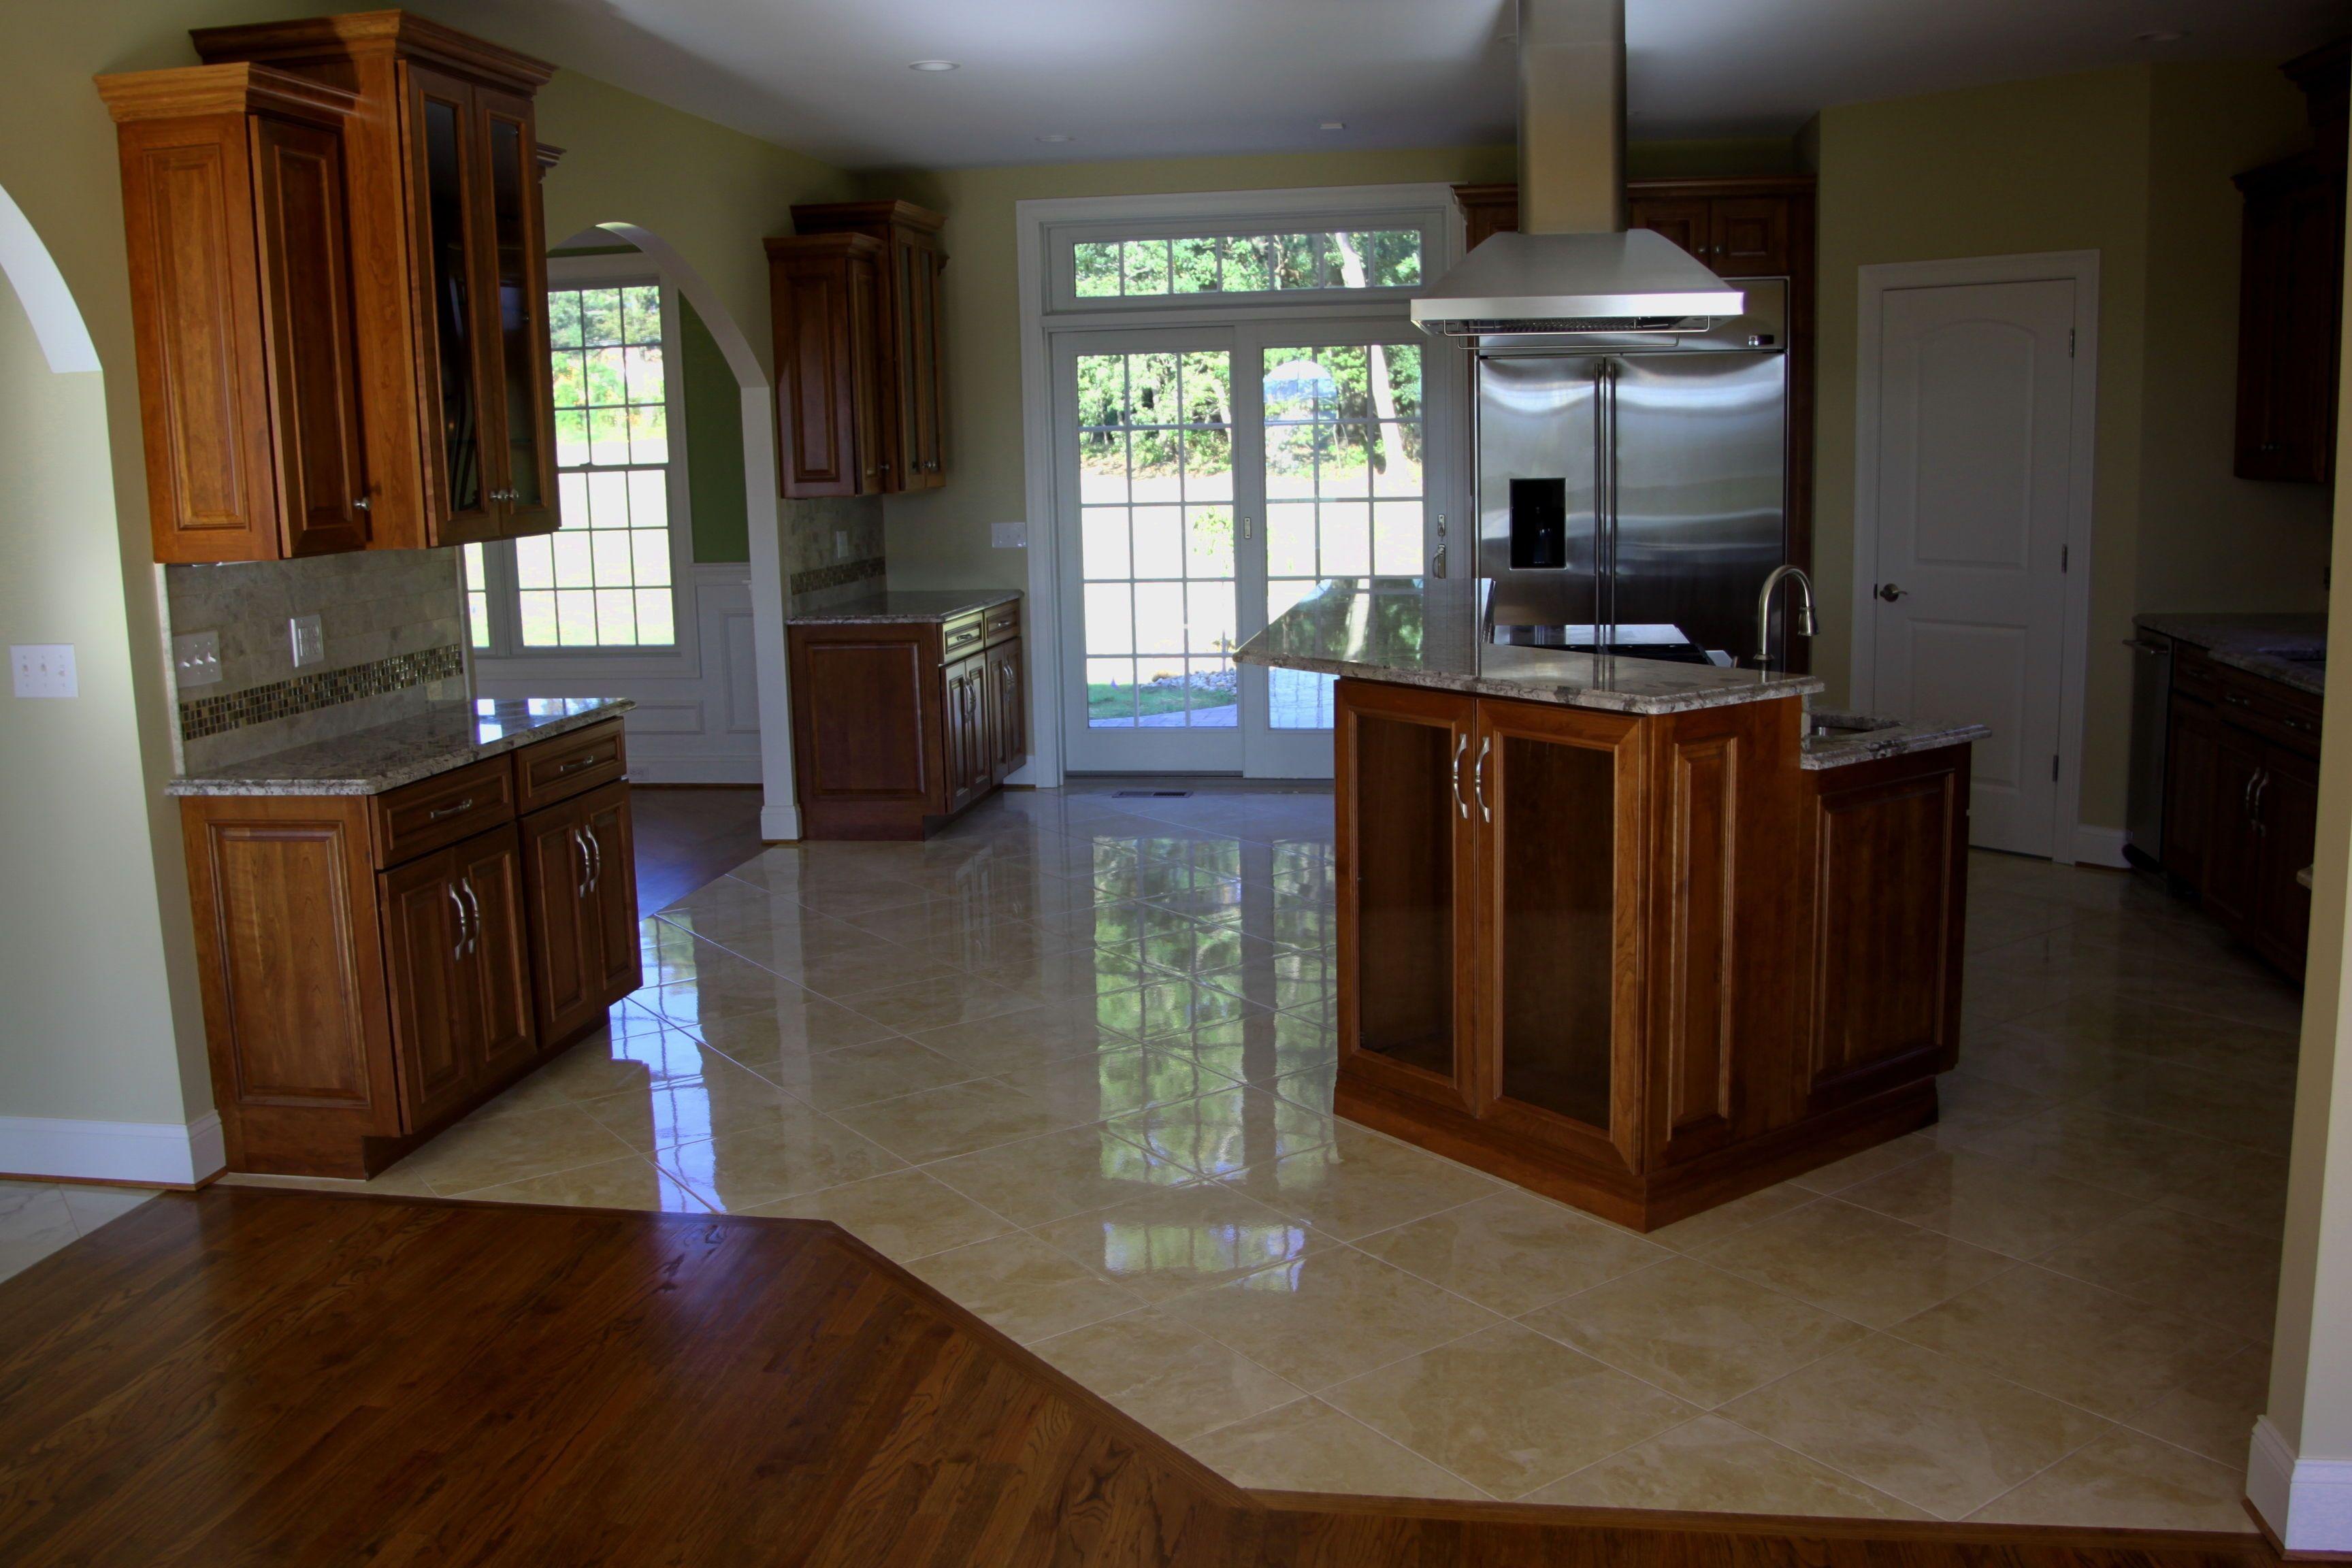 Porcelain Tile Ideas For Kitchen Floor  Httpviajesairmar Stunning Kitchen Floor Designs Decorating Inspiration